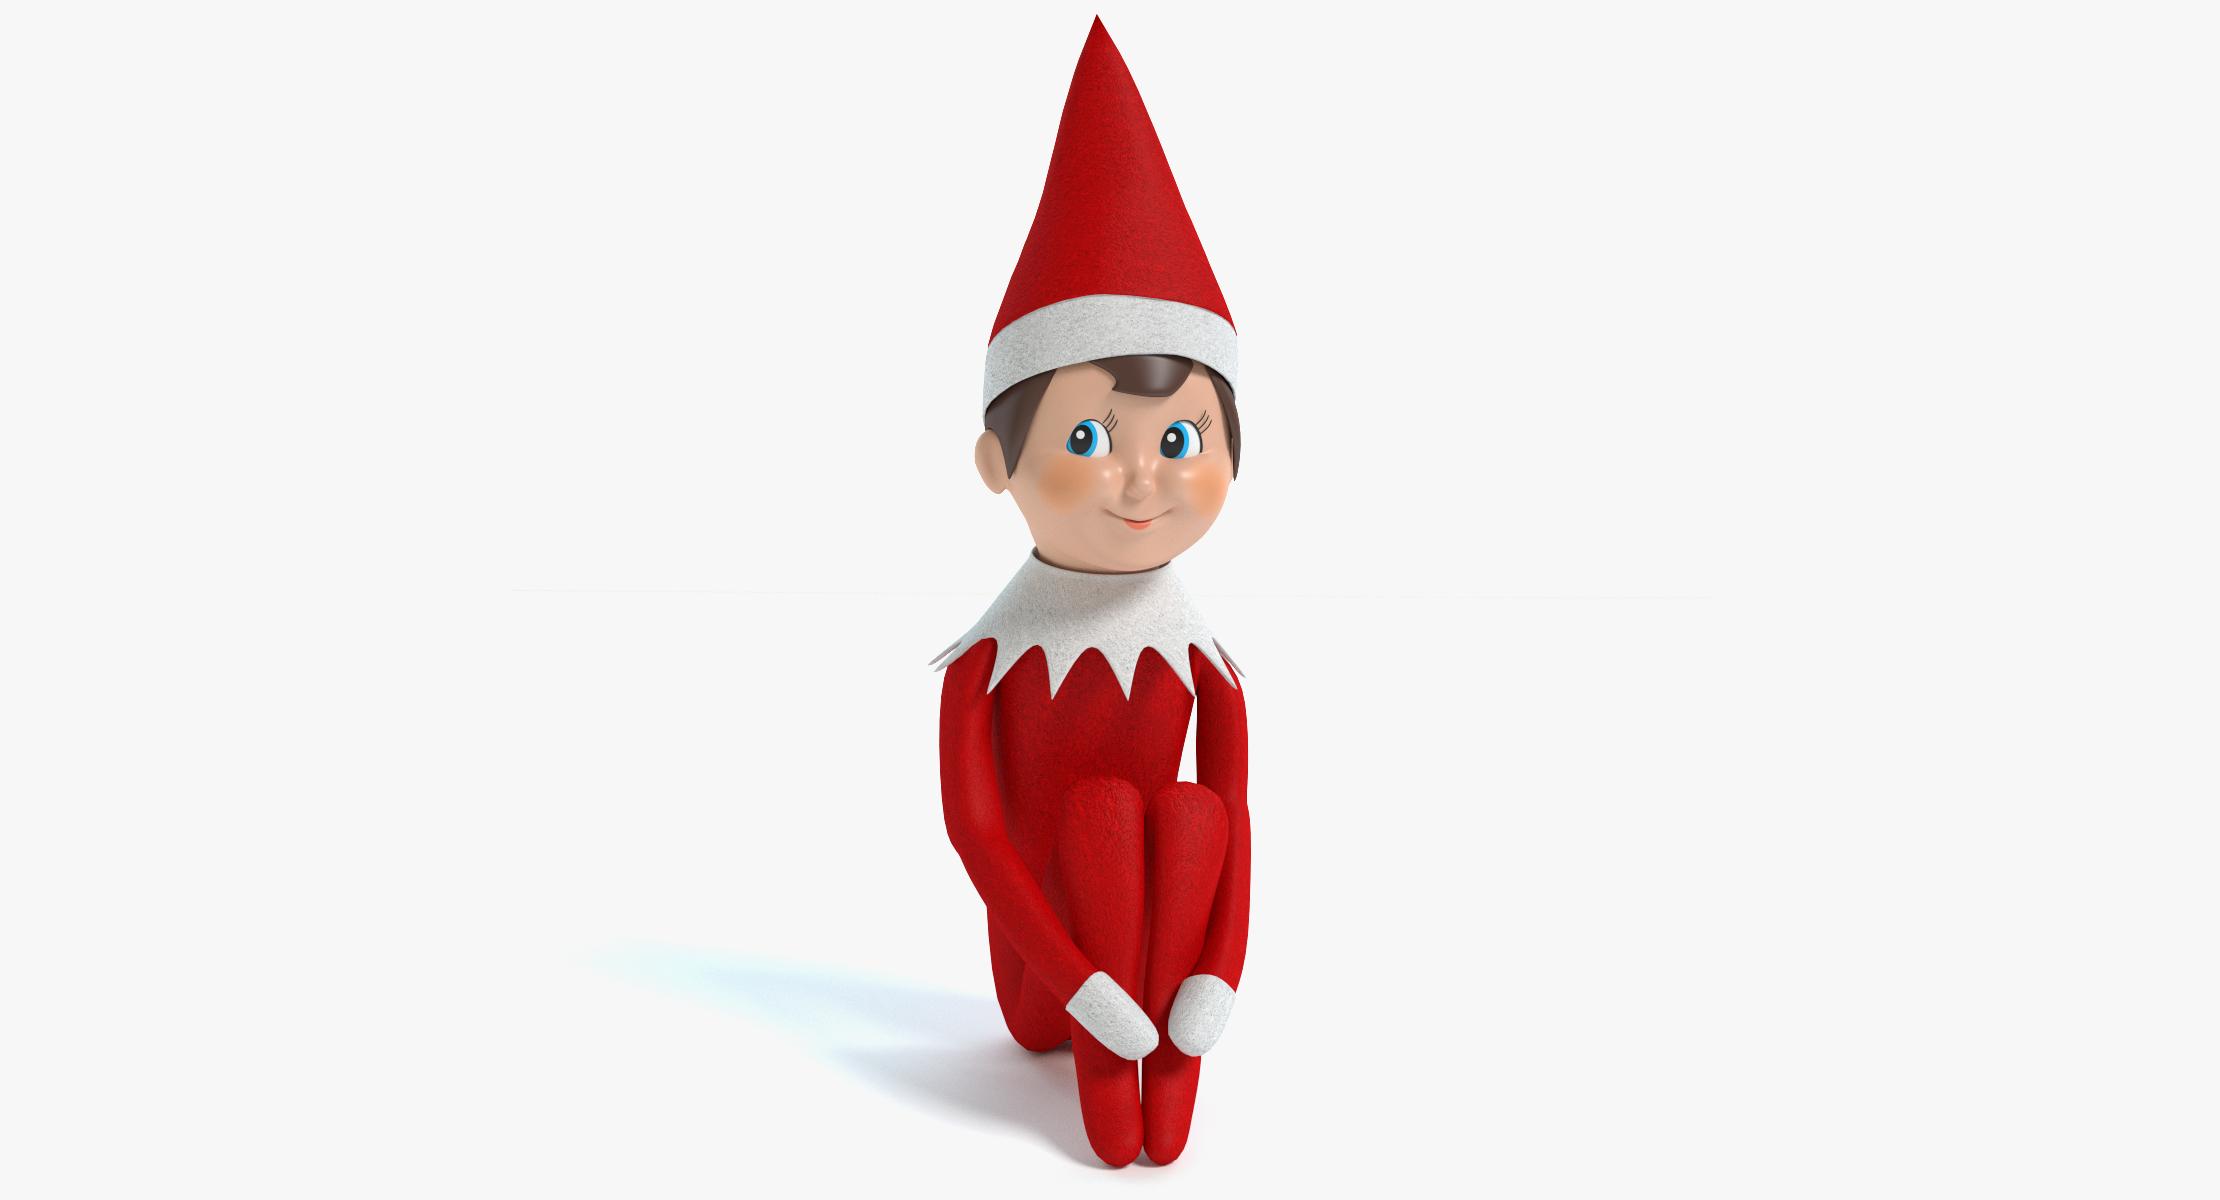 Christmas Elf On The Shelf Images.Elf On The Shelf